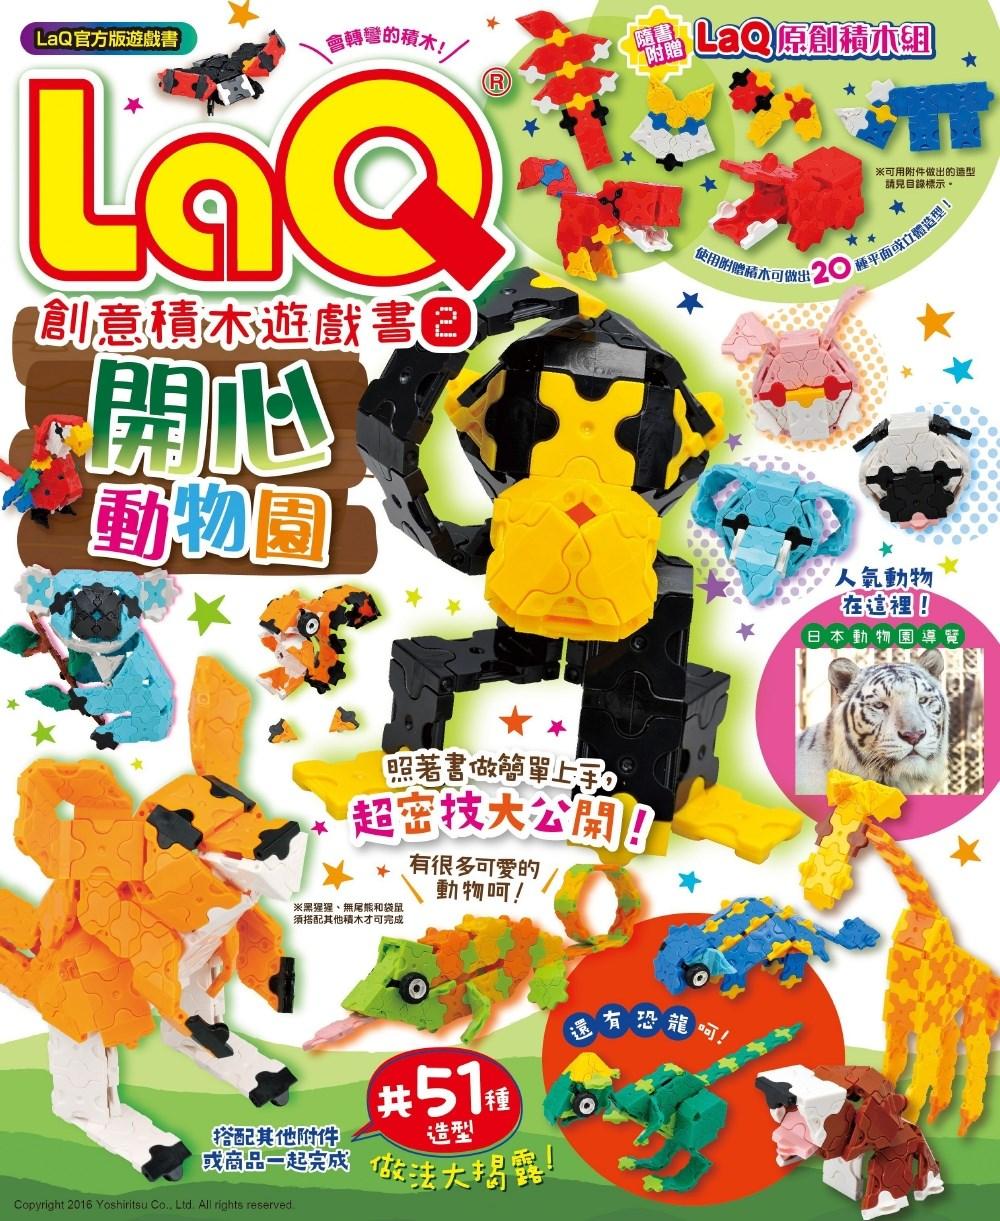 LaQ創意積木遊戲書2:開心動物園(隨書附贈日本原裝LaQ原創積木組)